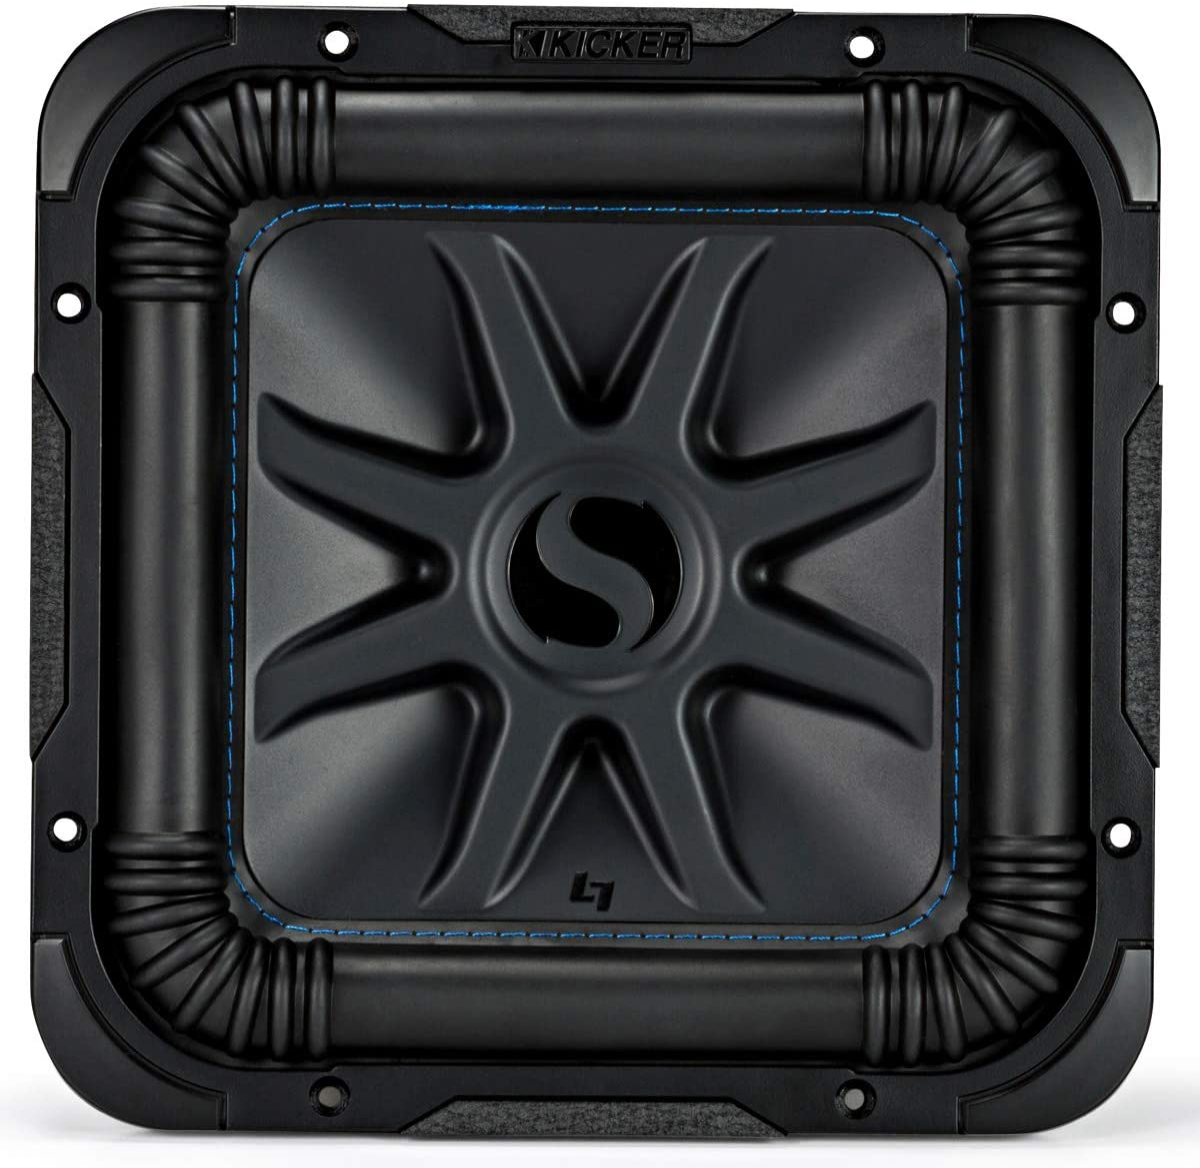 Loaded Kicker Bundle 44L7S124 Car Audio Solo-Baric 12 Sub Box and CXA800.1 Amp Bundle